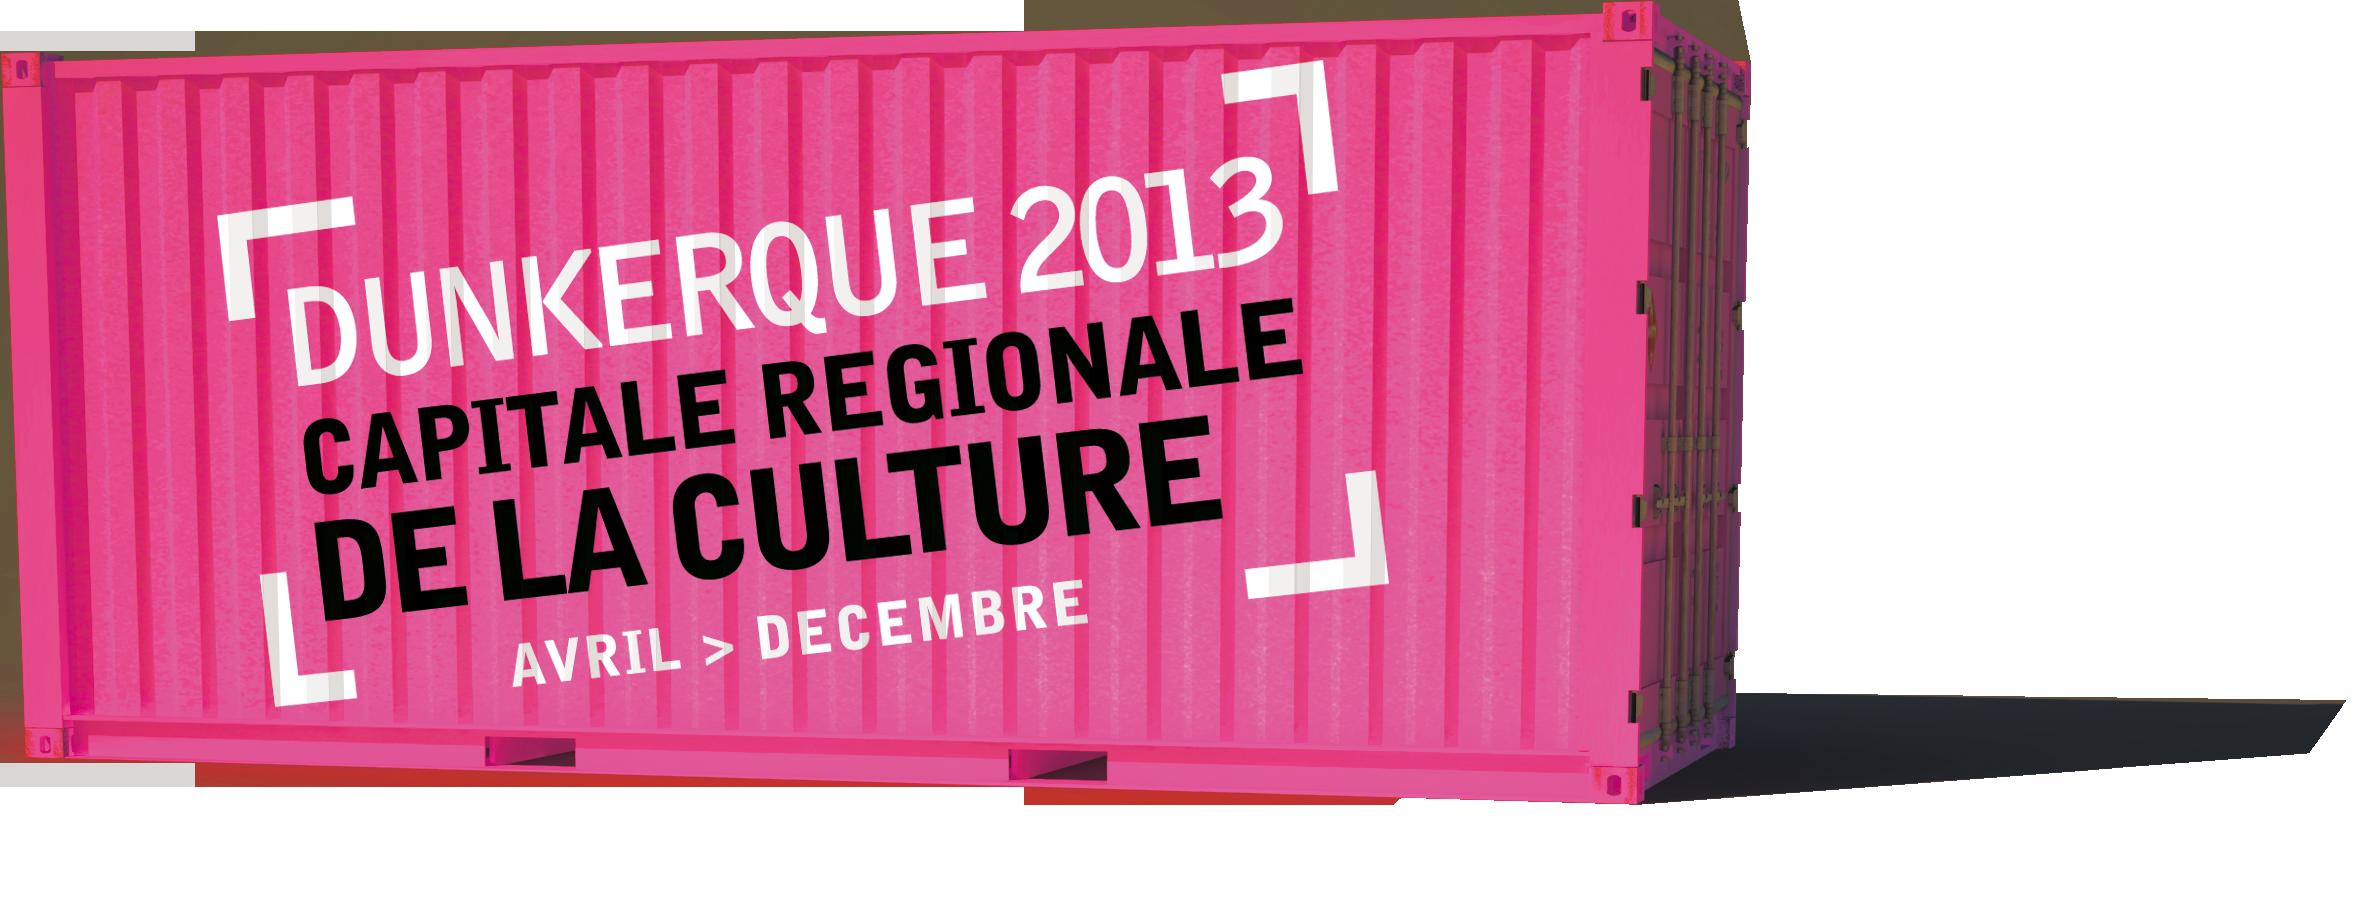 Container rose Dunkerque 2013